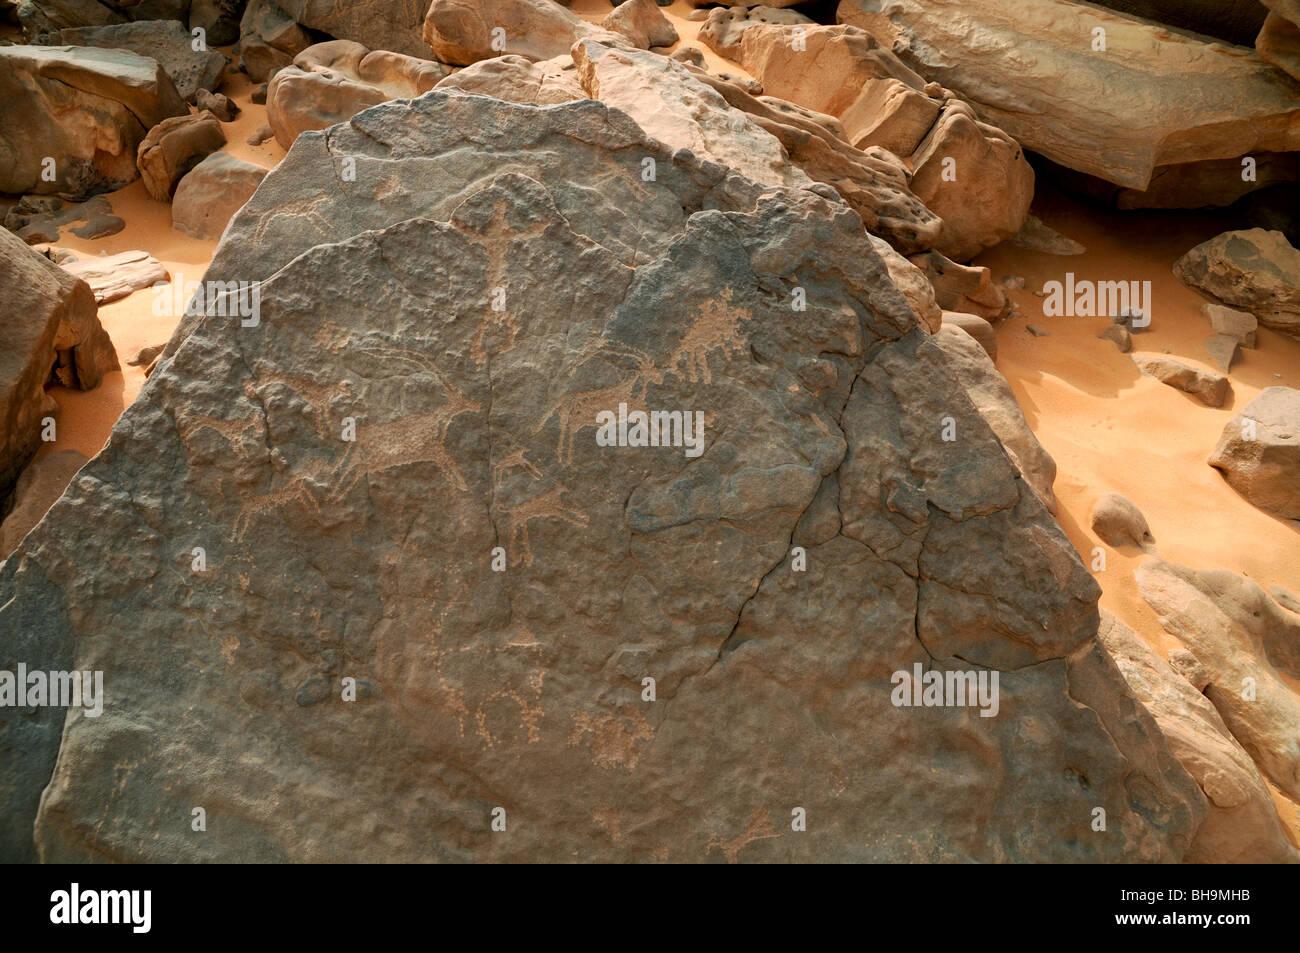 Neolithic rock art depictions of wildlife at Wadi Hamra in the Gilf Kebir region of the Western Desert of Egypt, Stock Photo